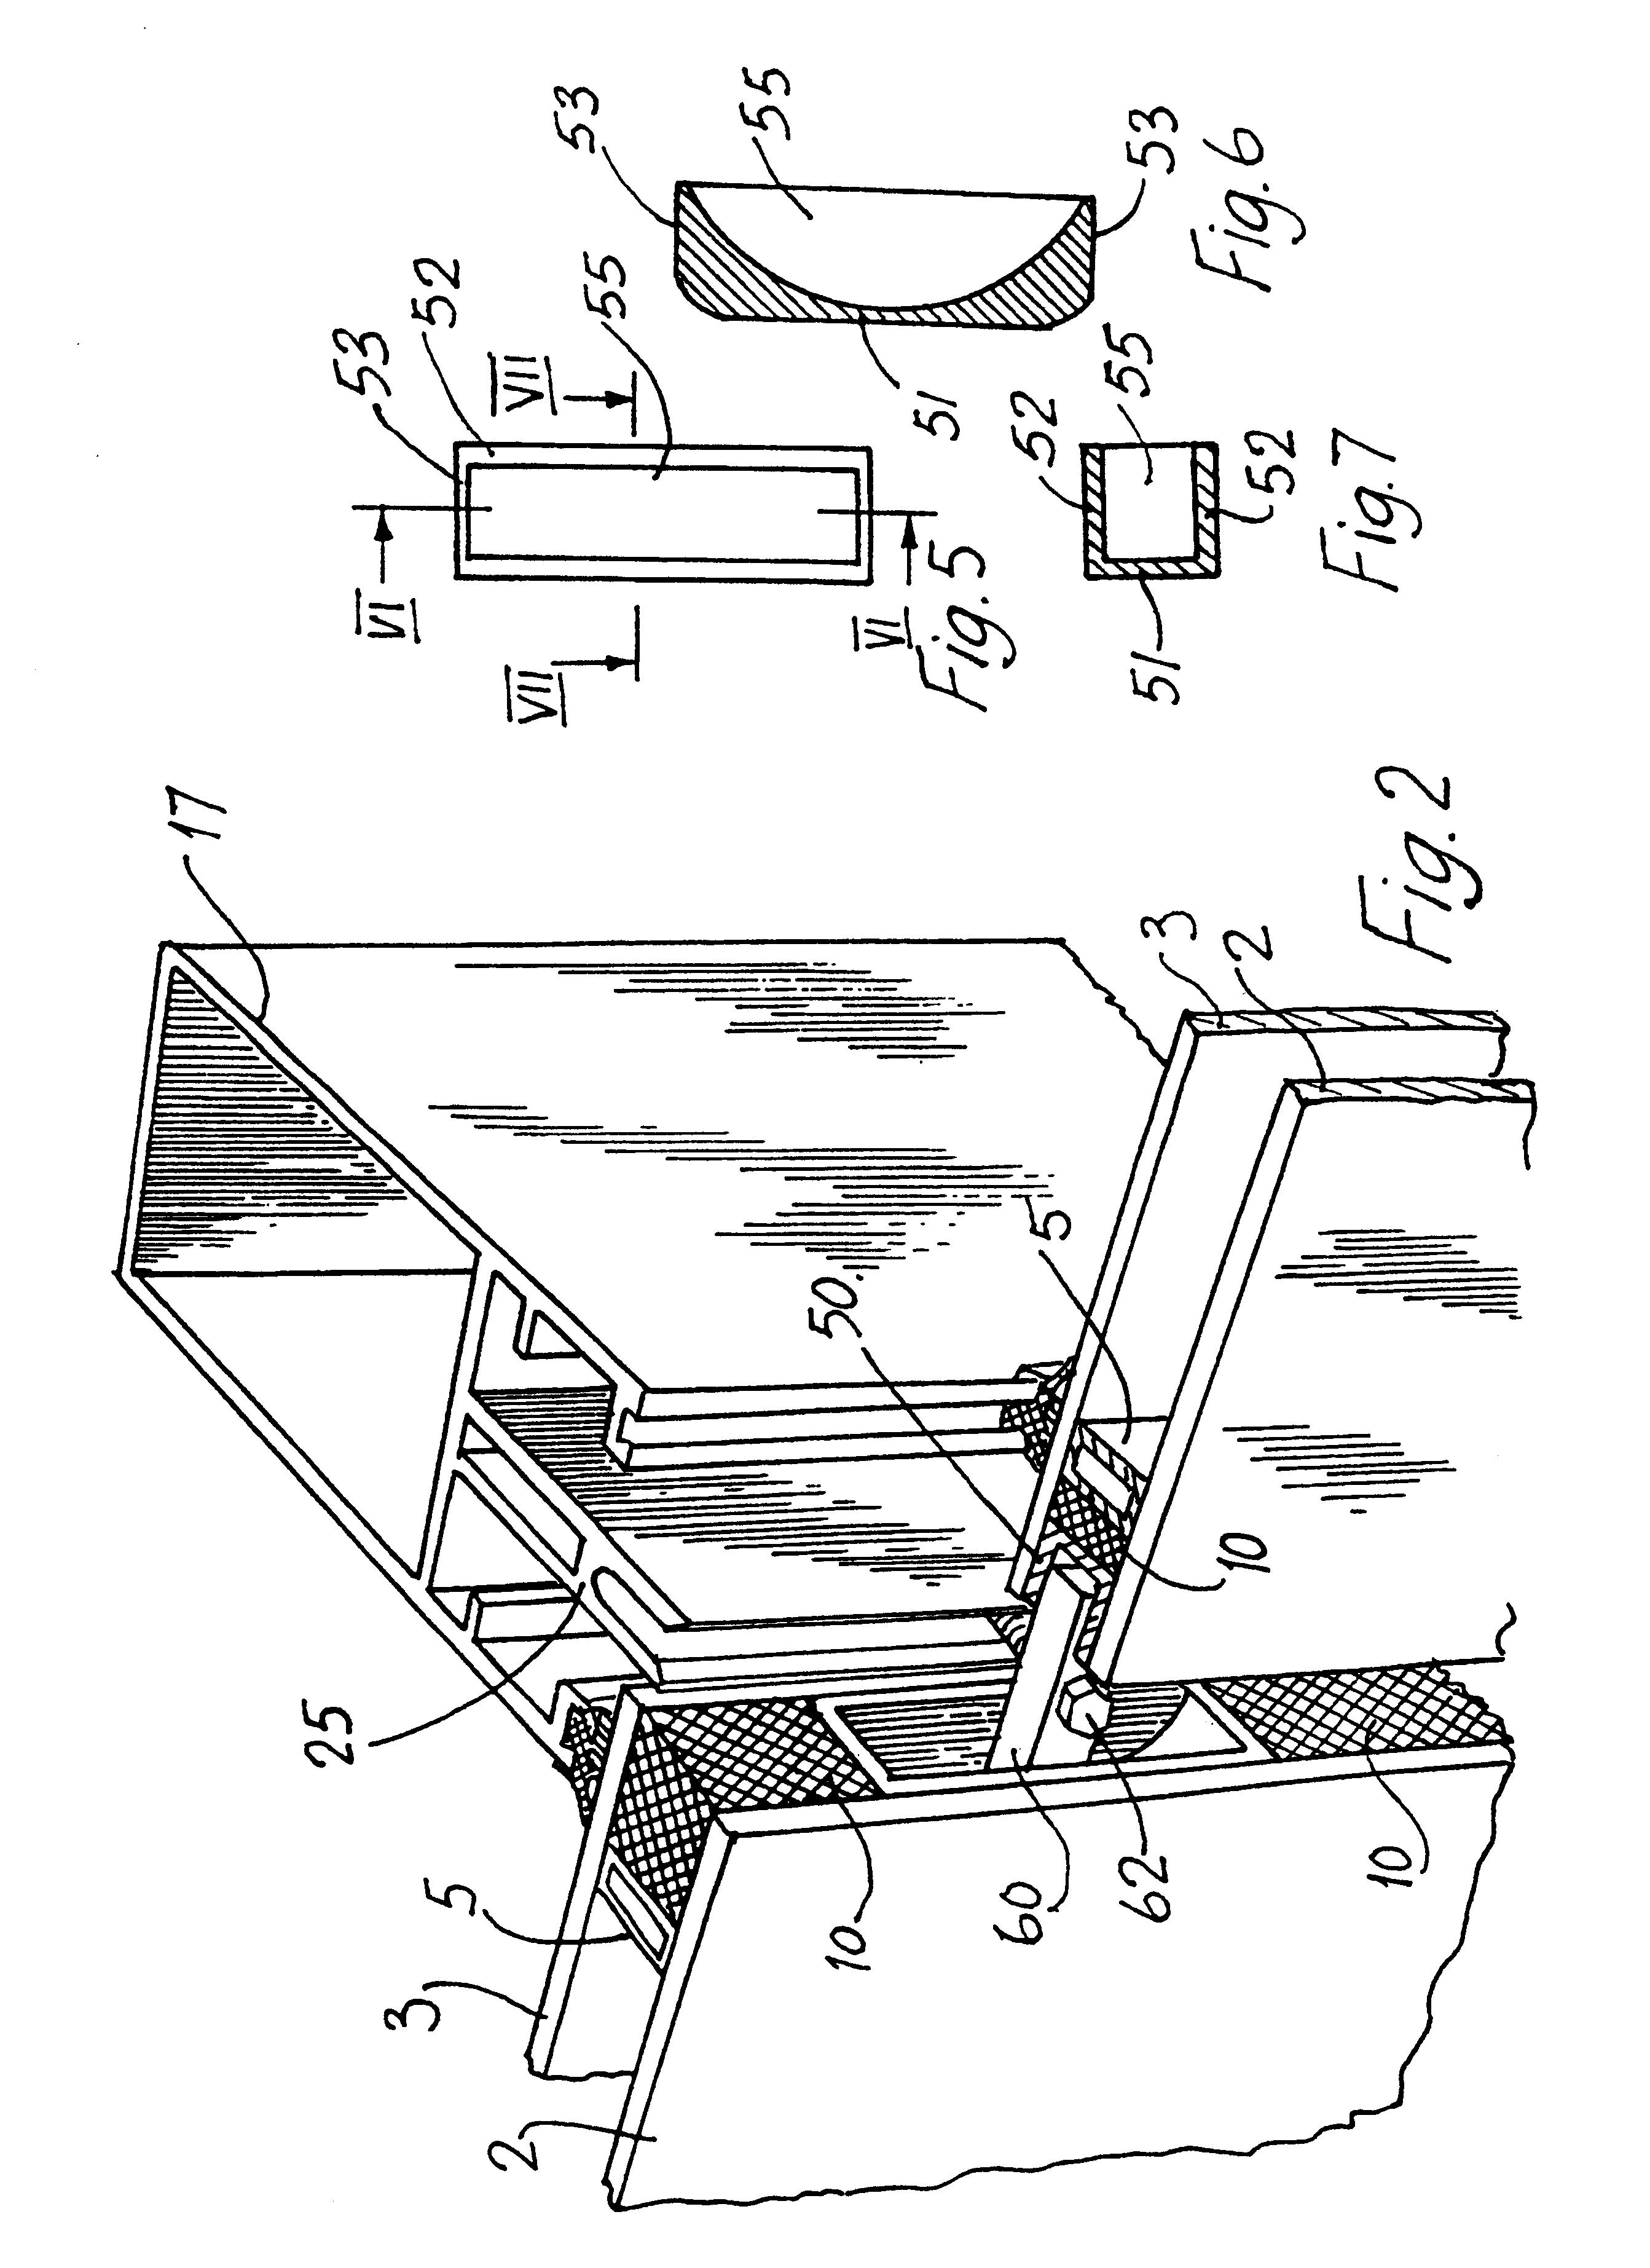 Insulated Glass Assembly : Patent us glazing assembly google patents